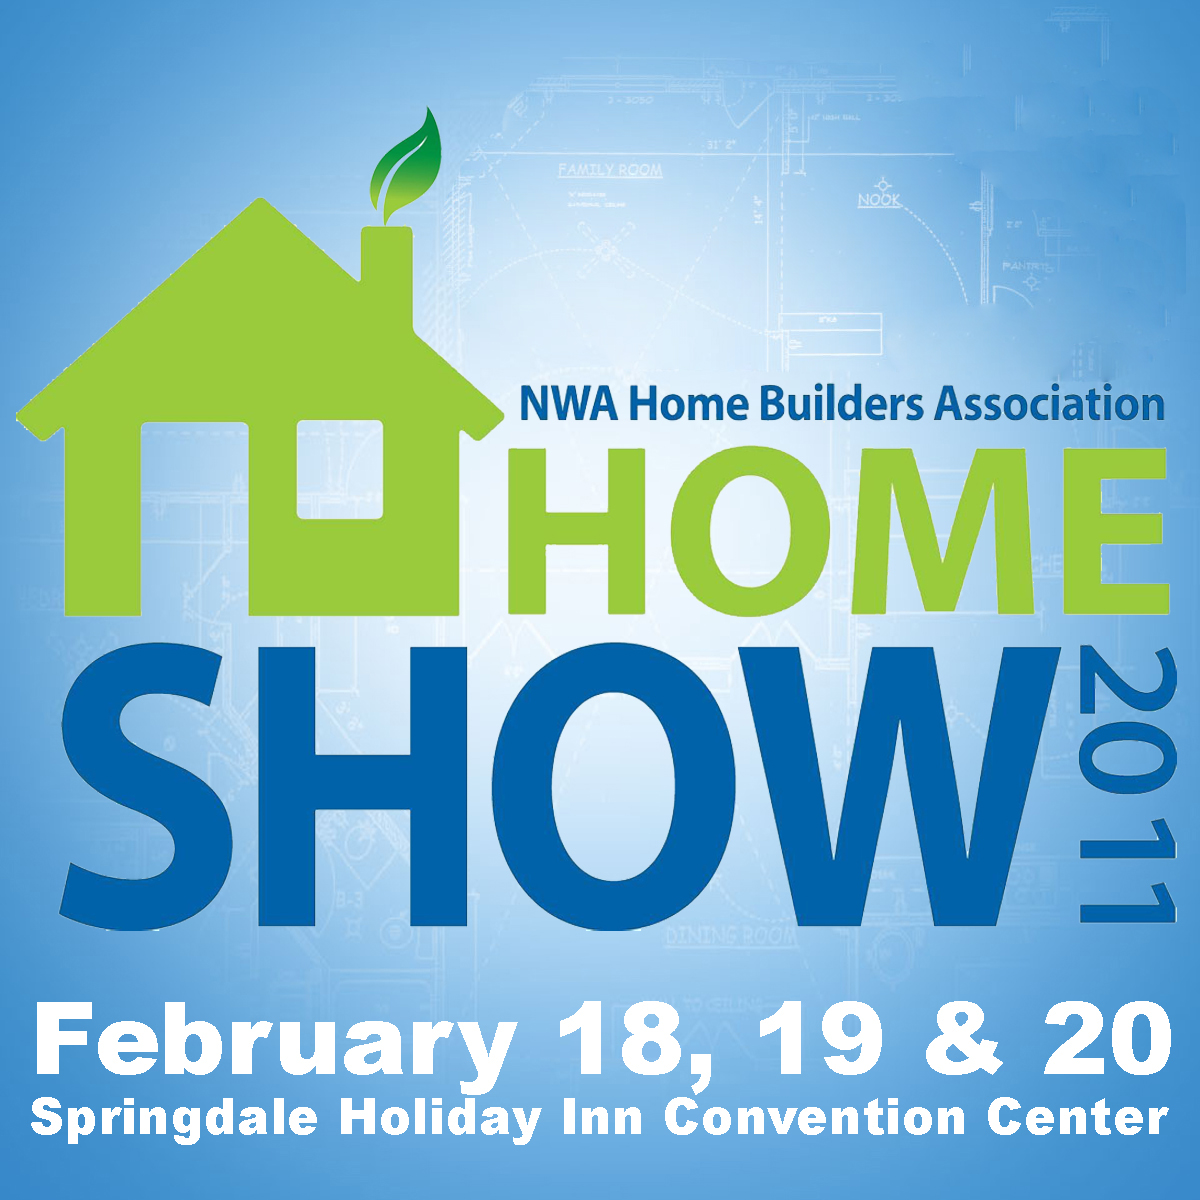 Northwest Arkansas Home Builders Association: 2011 HOME